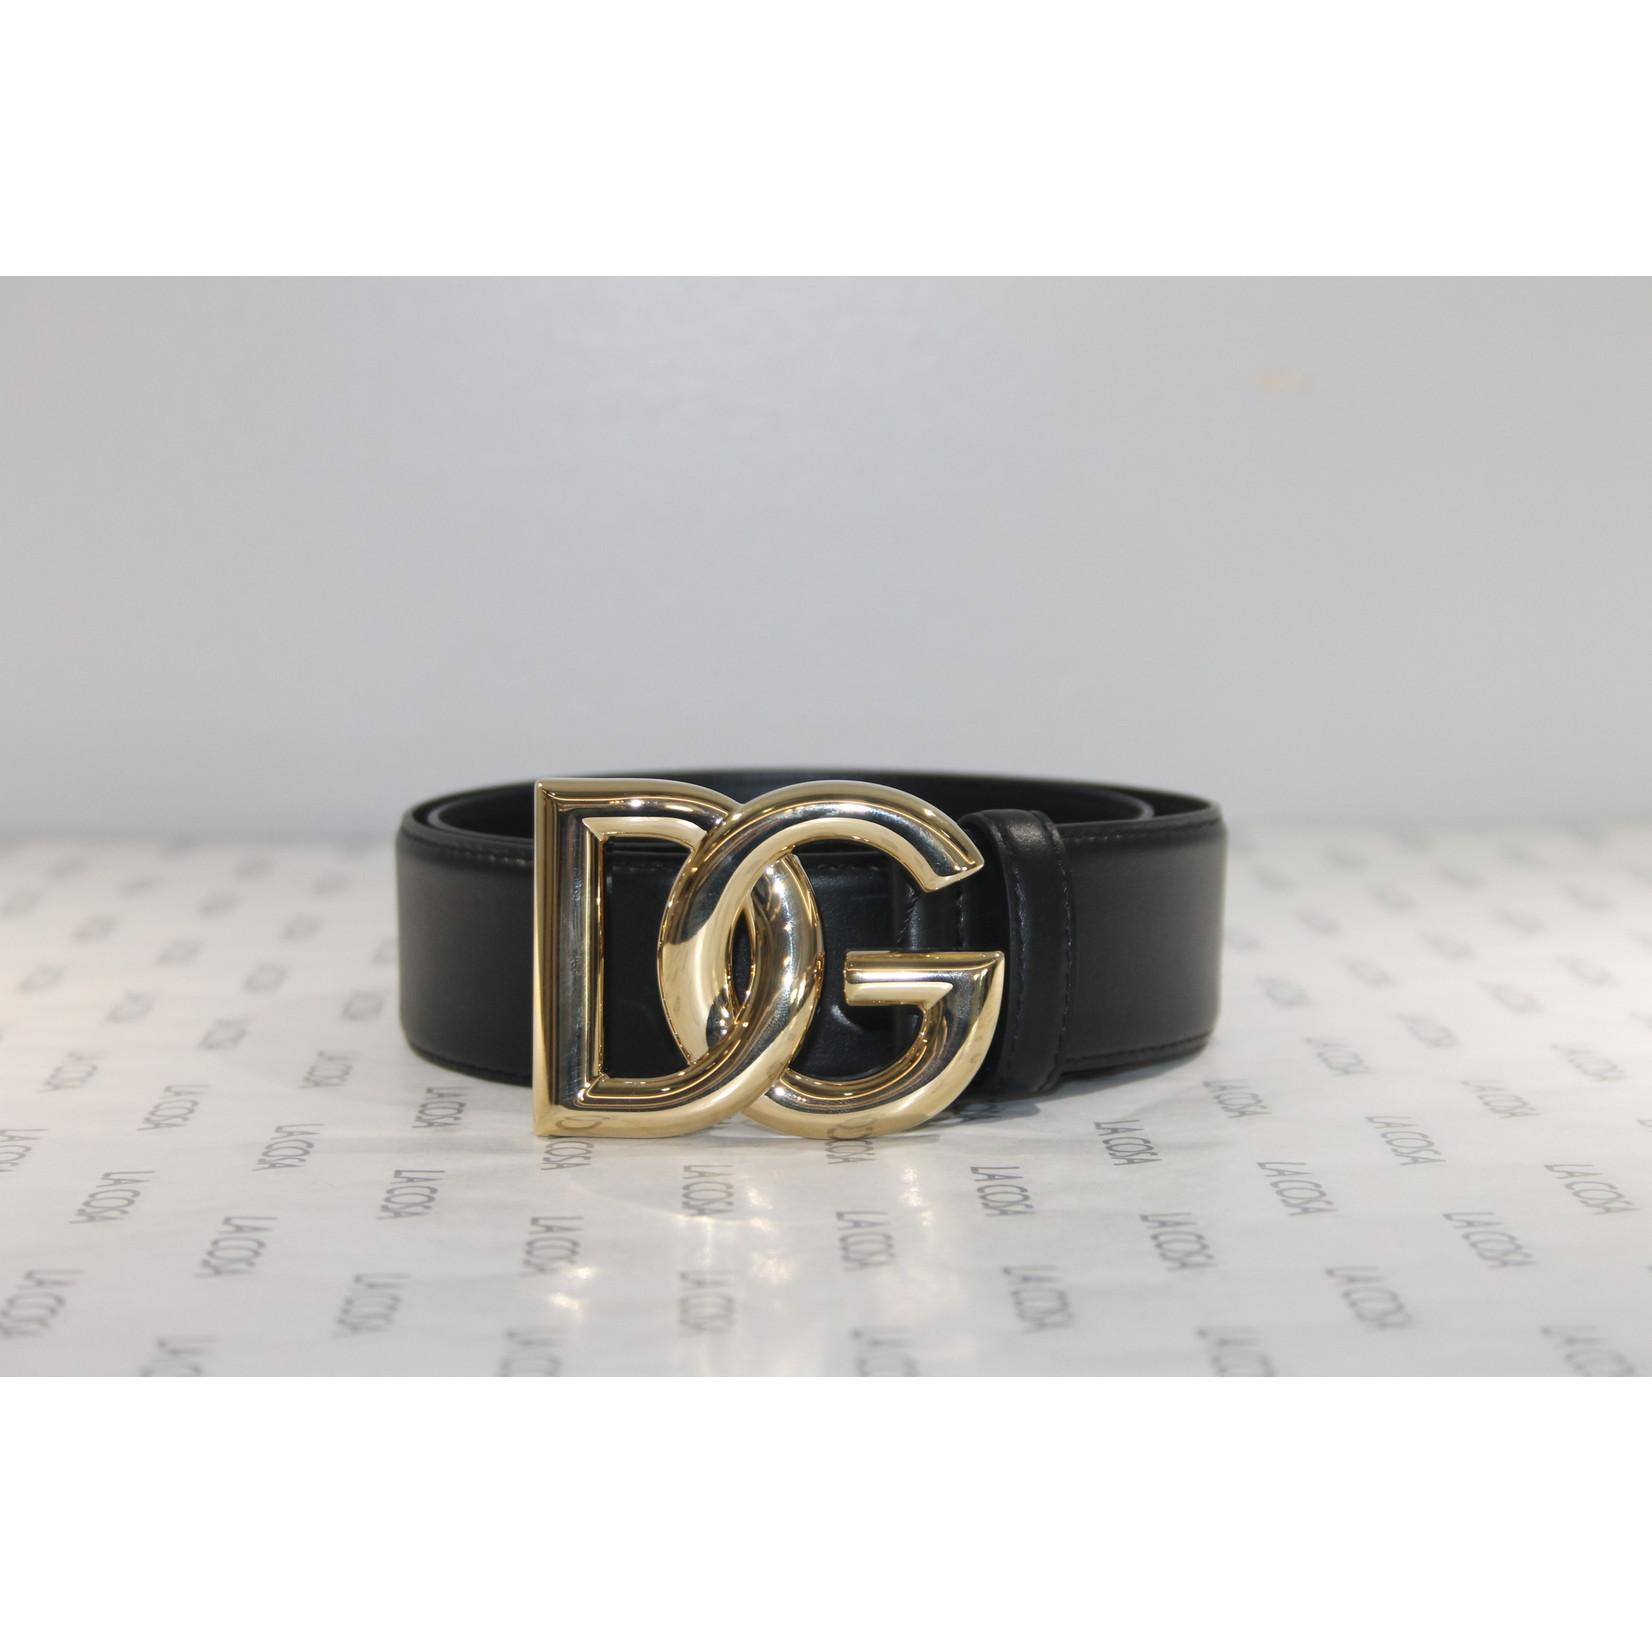 Dolce&Gabbana Riemen Riemen 42987